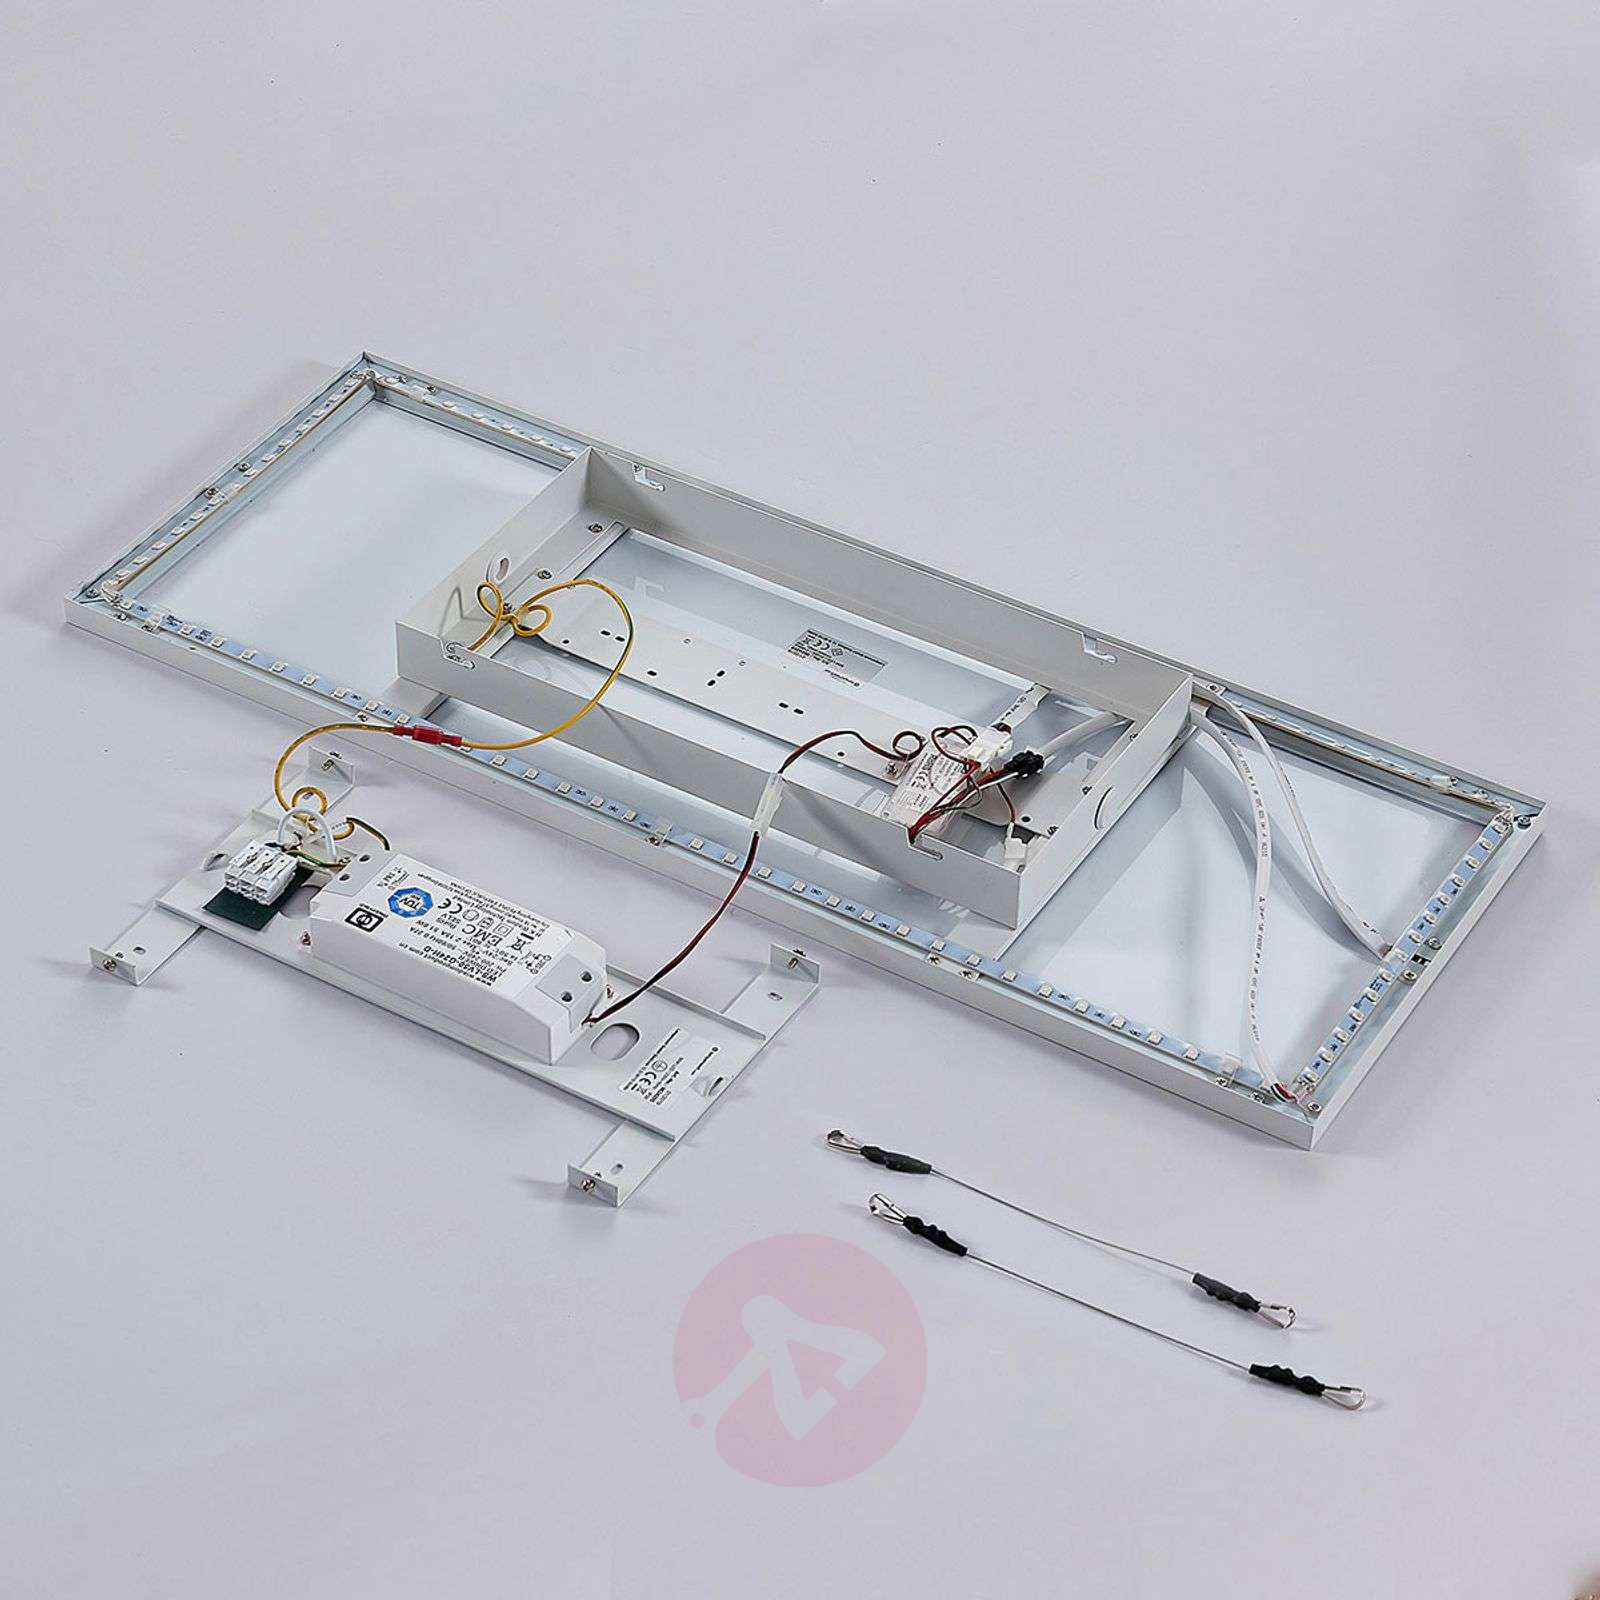 LED panel Brenda CCT with remote, 30 x 80cm-9624205-02